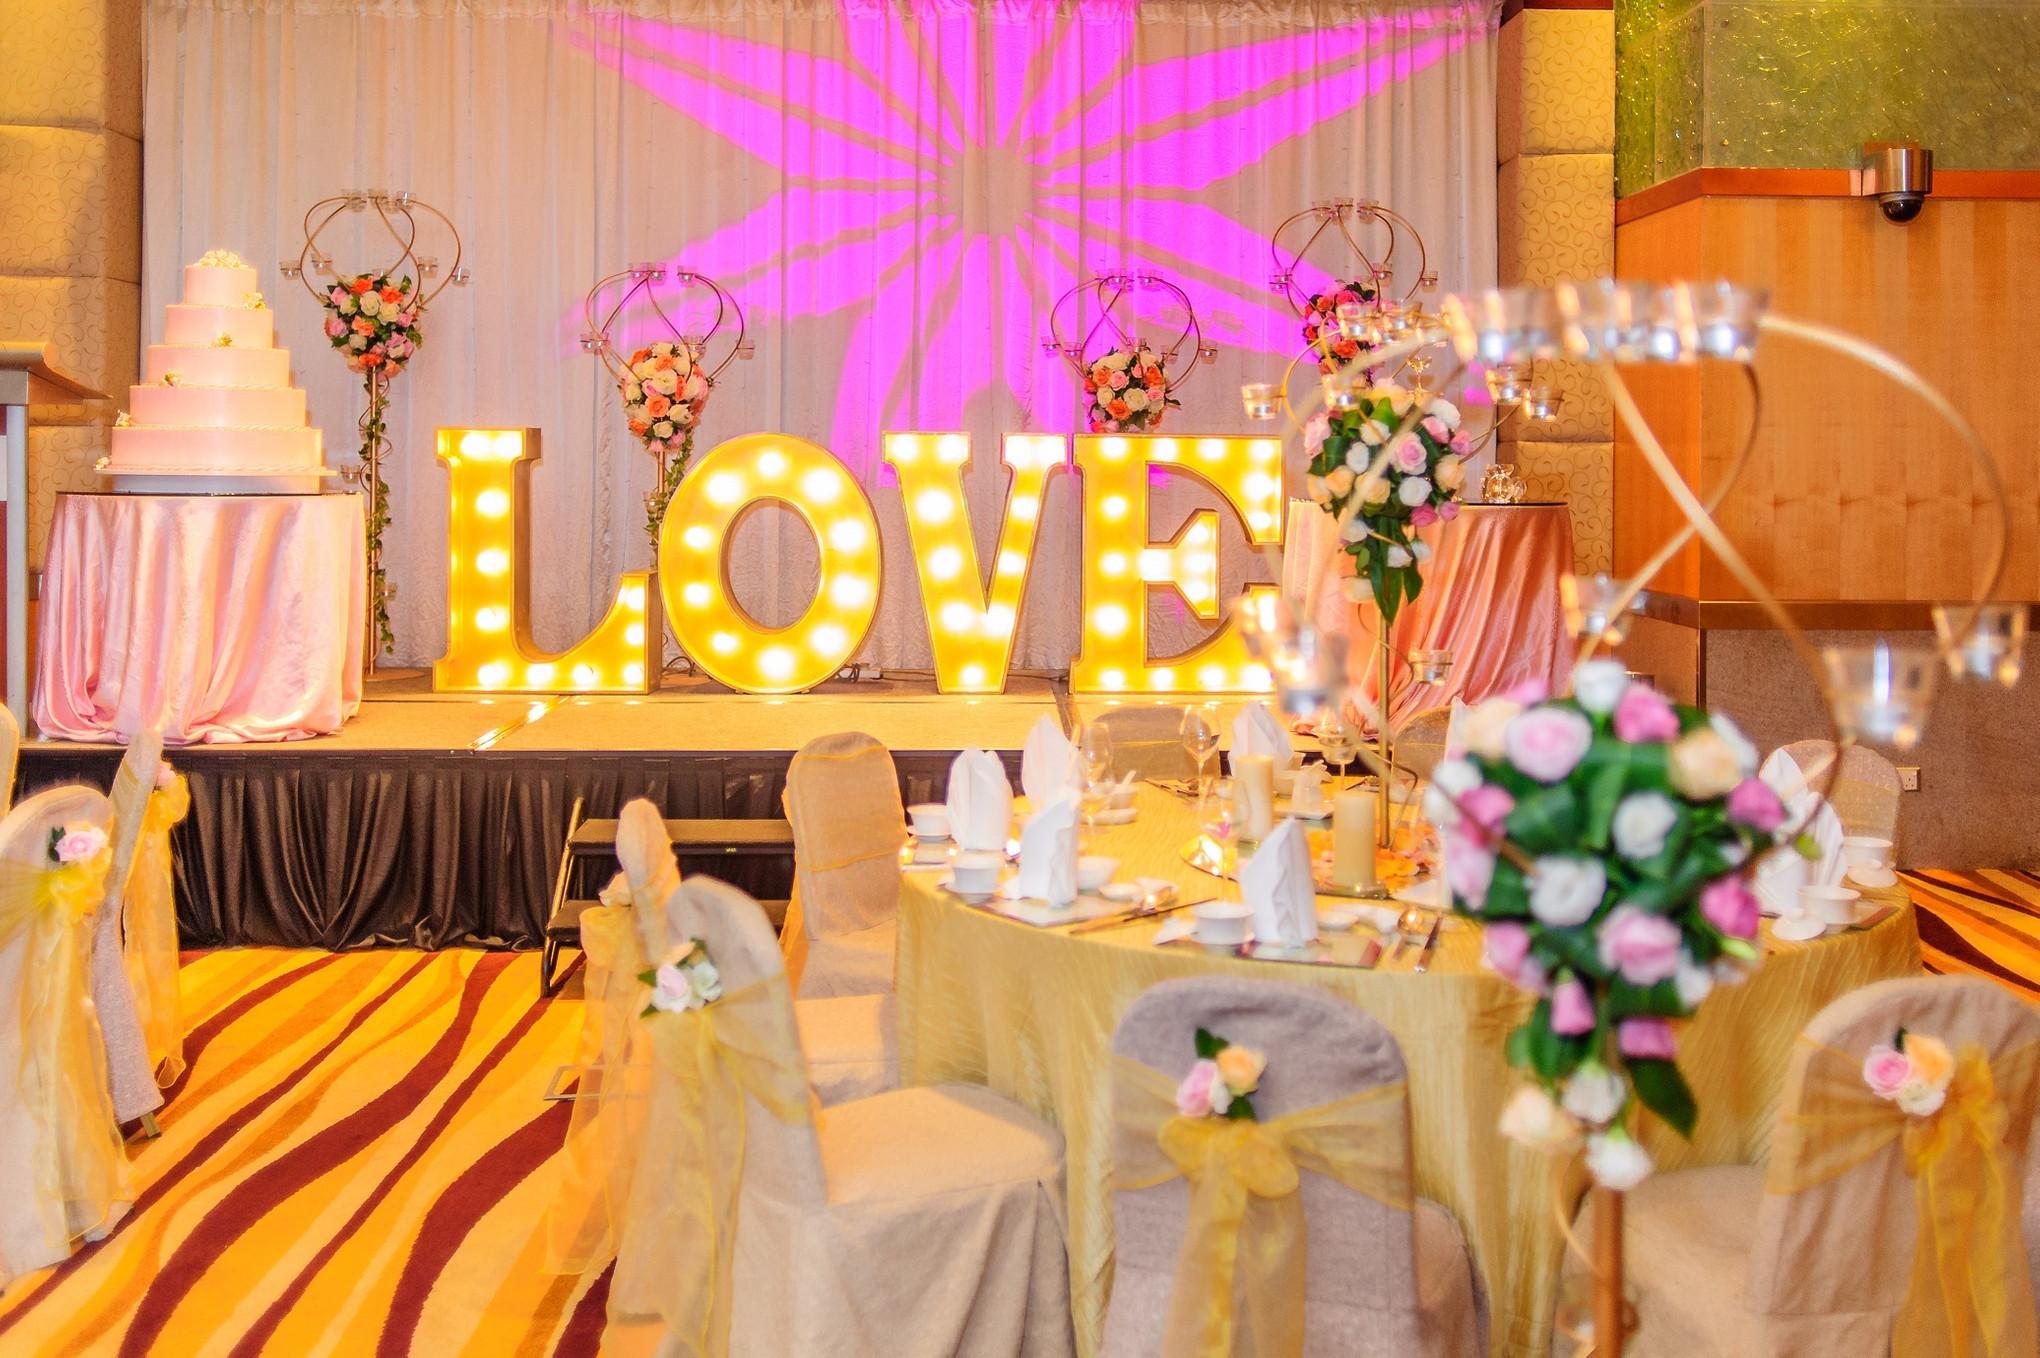 8 Things To Consider When Choosing A Wedding Venue Bridestory Blog